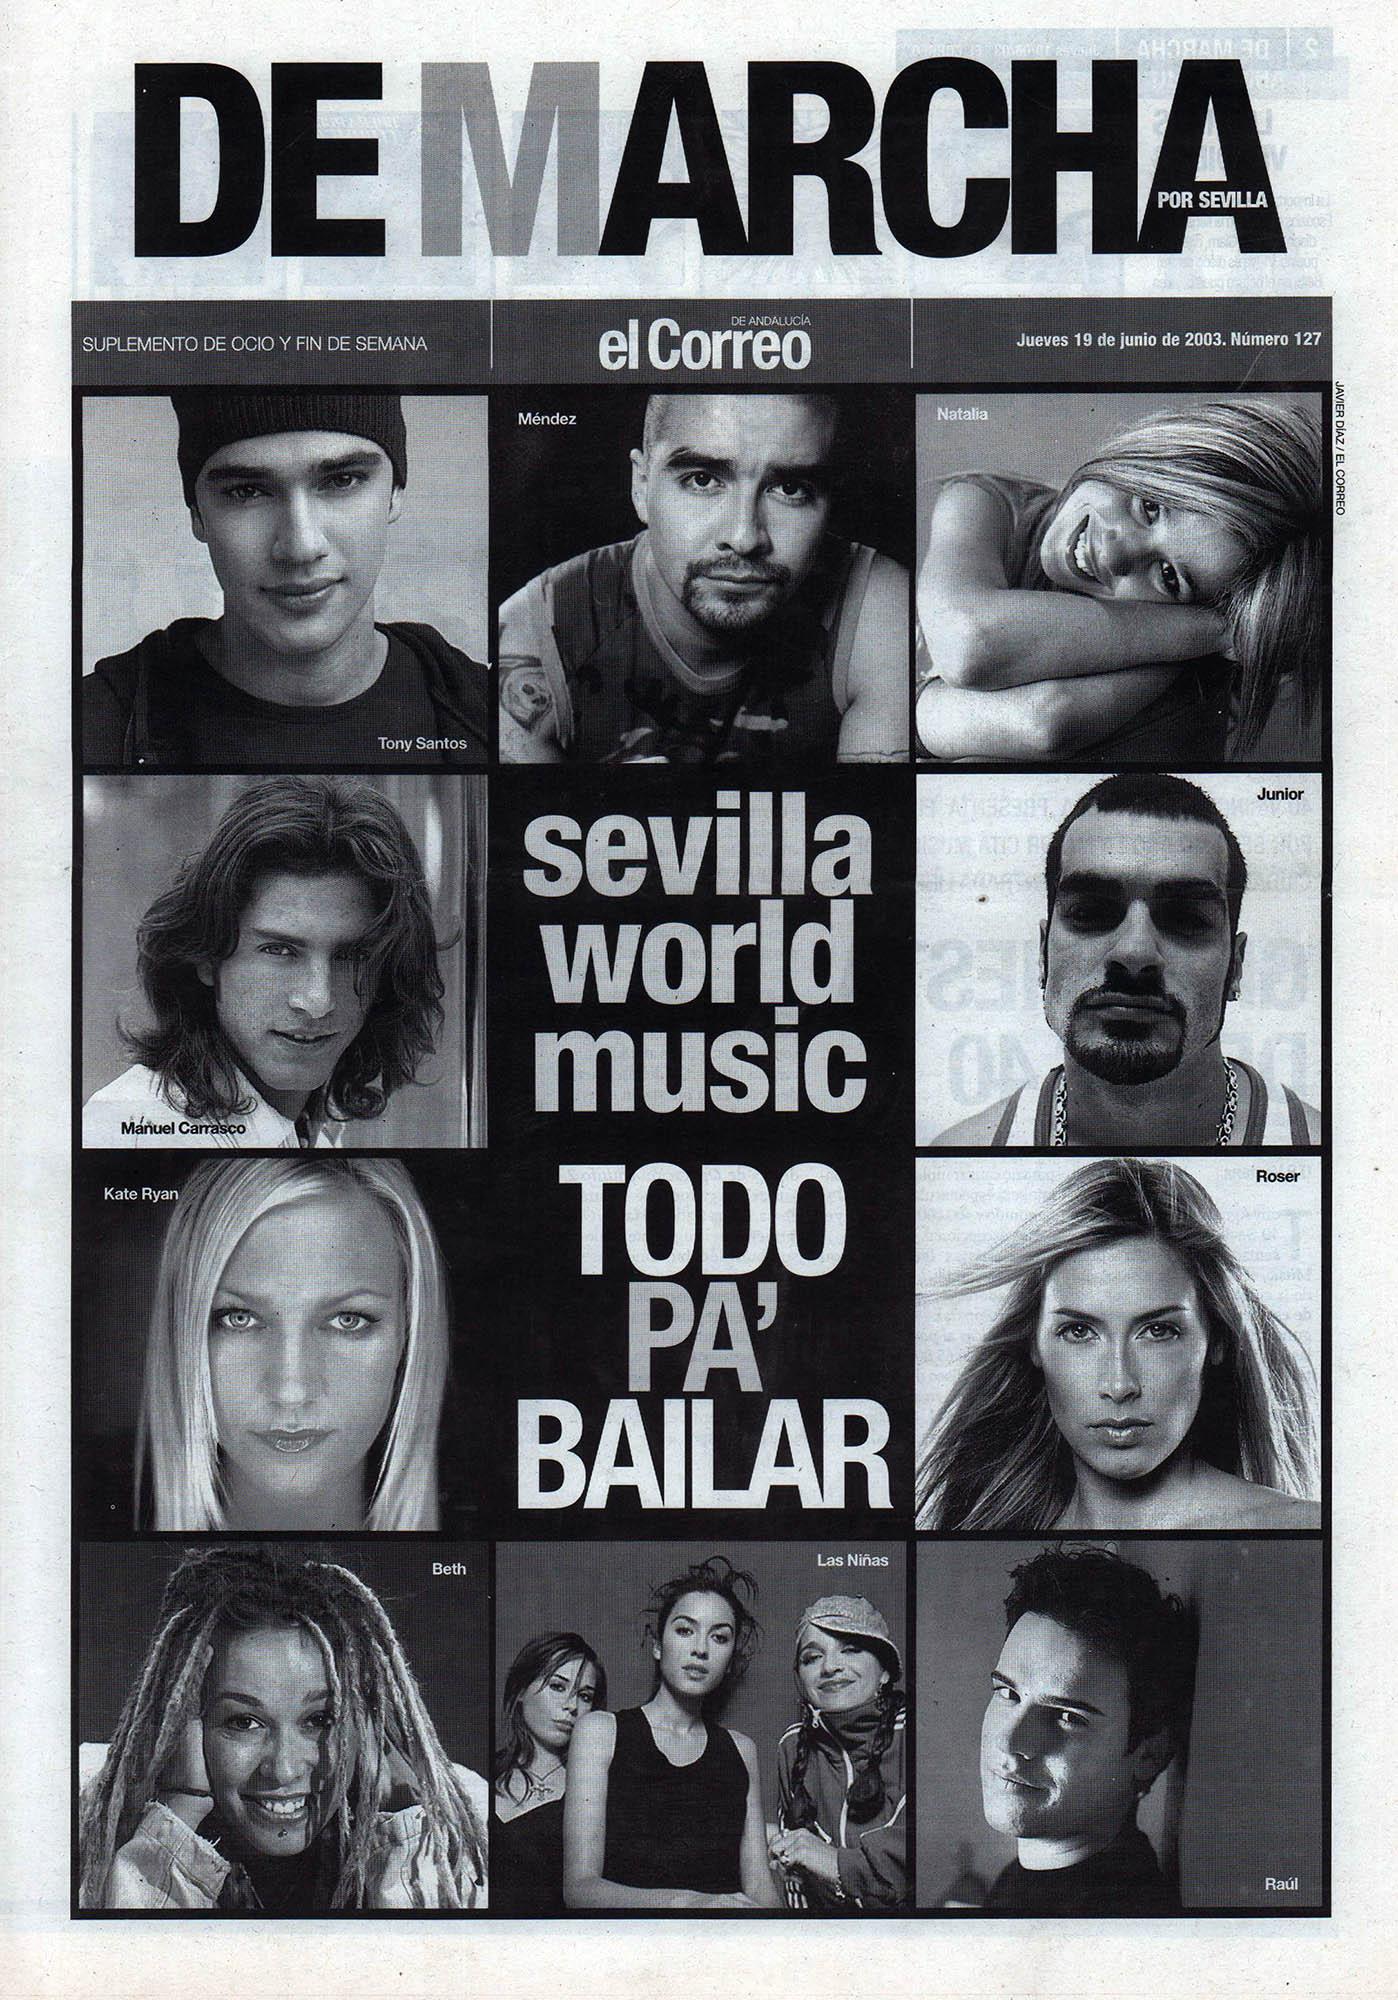 Sevilla World Music - Todo pa' bailar | De Marcha - El Correo | 19 jun 2003